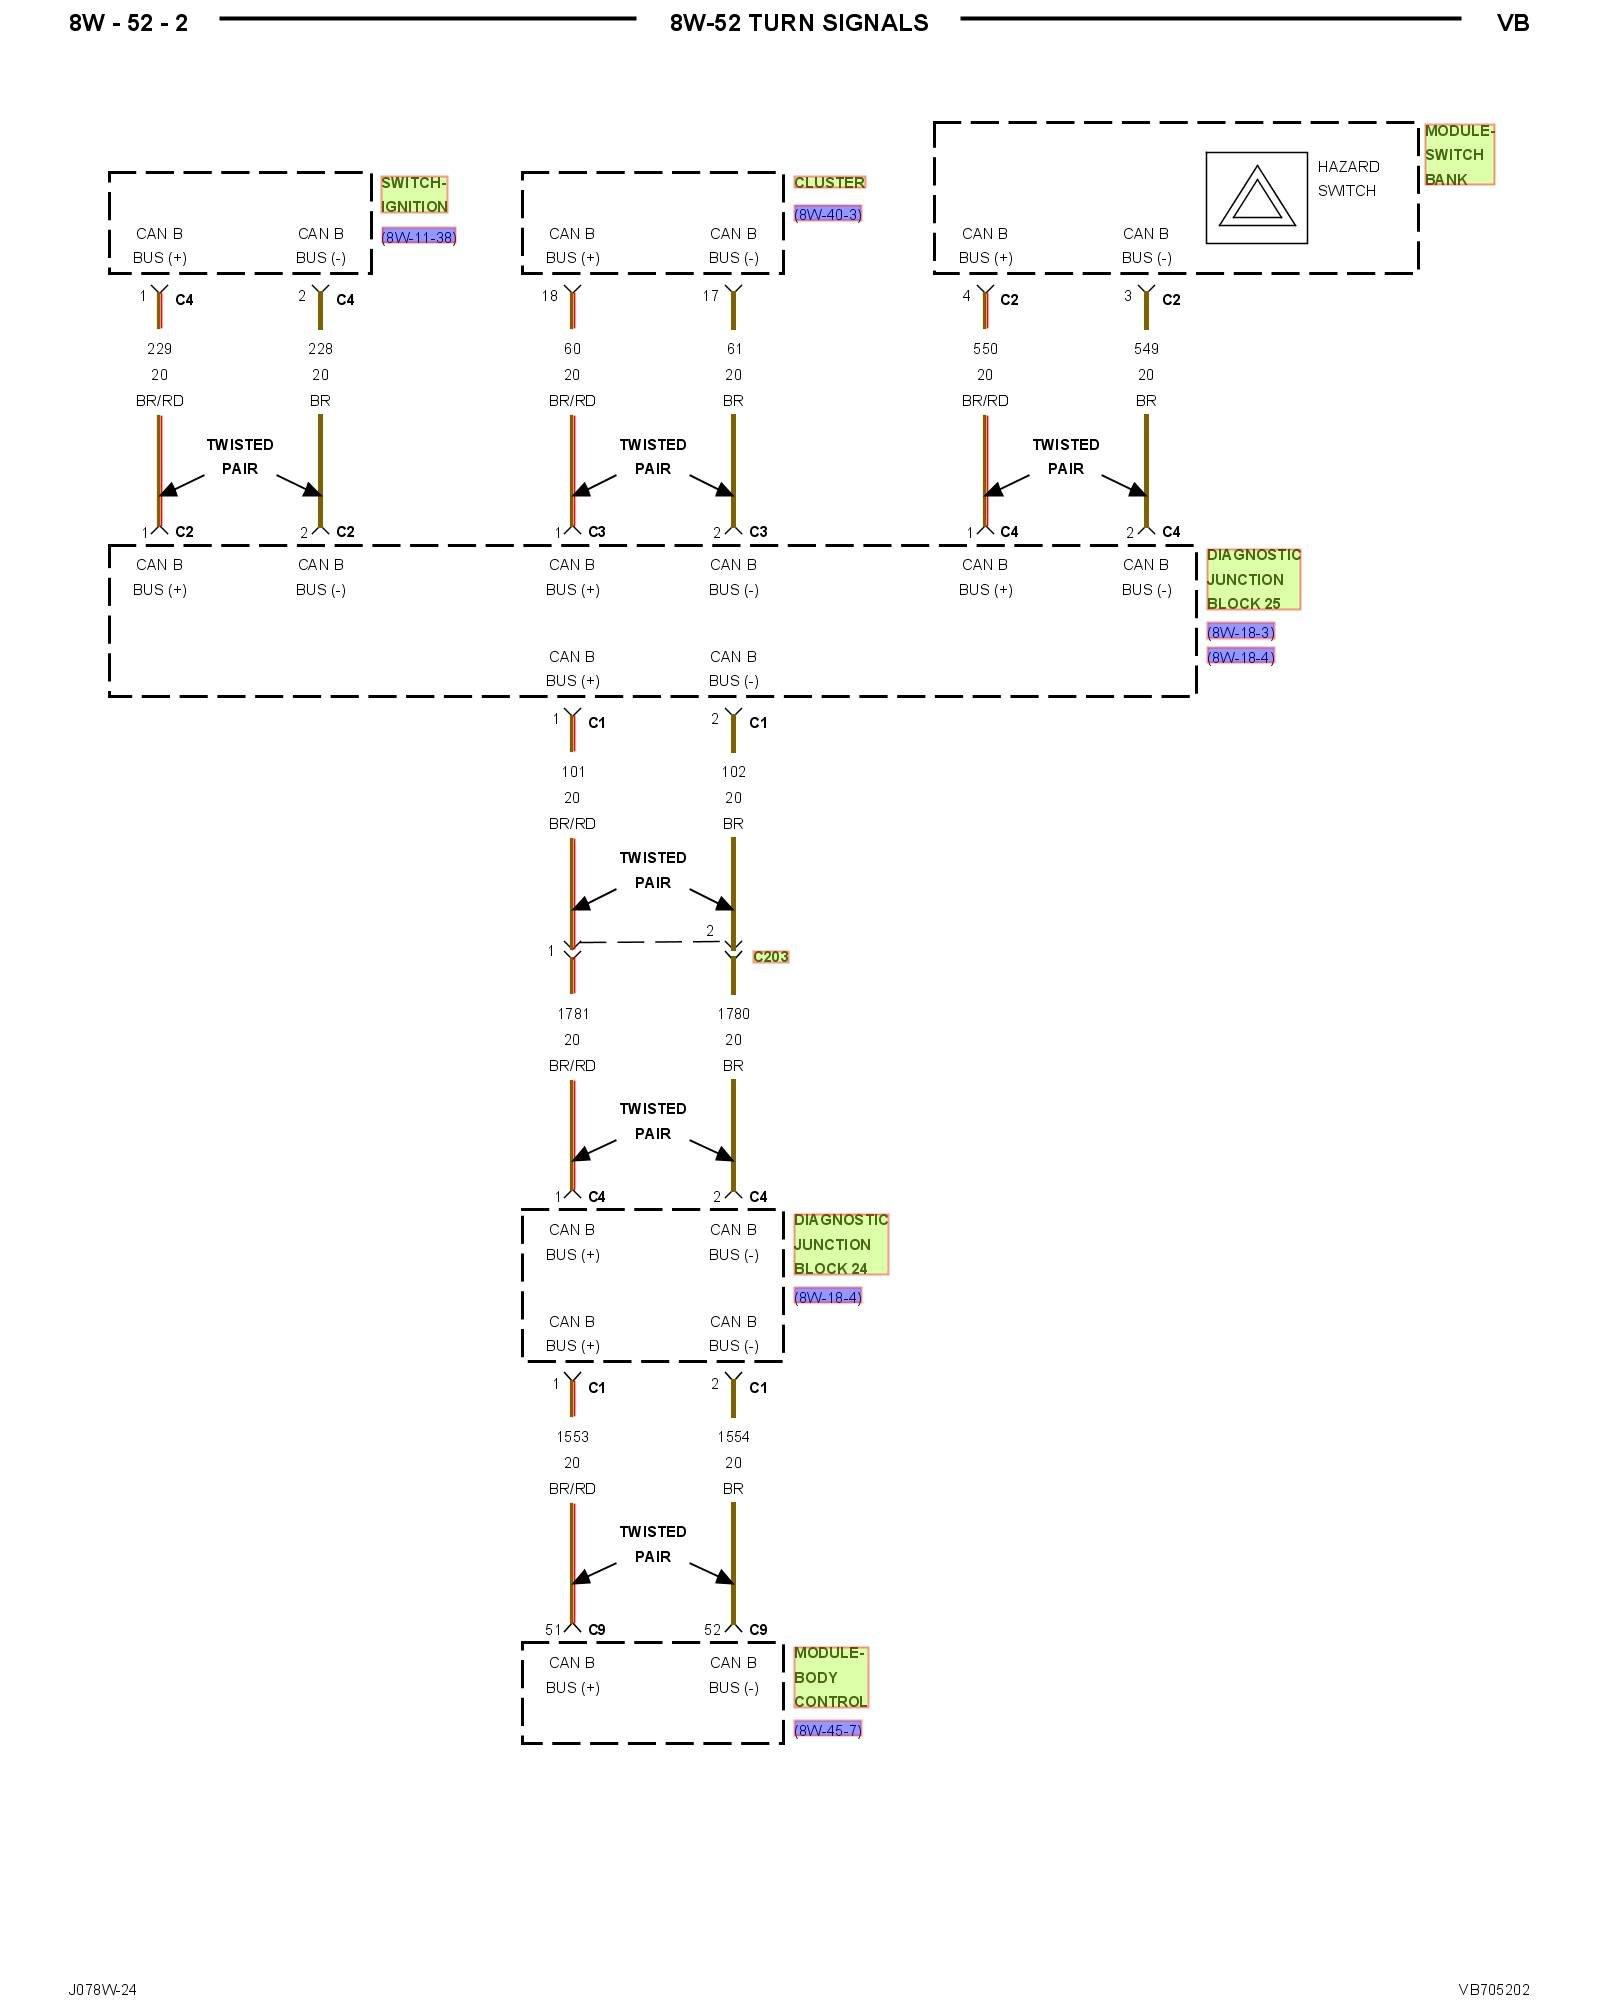 I Need Wiring Diagram For 2008 Dodge Sprinter 2500 Van